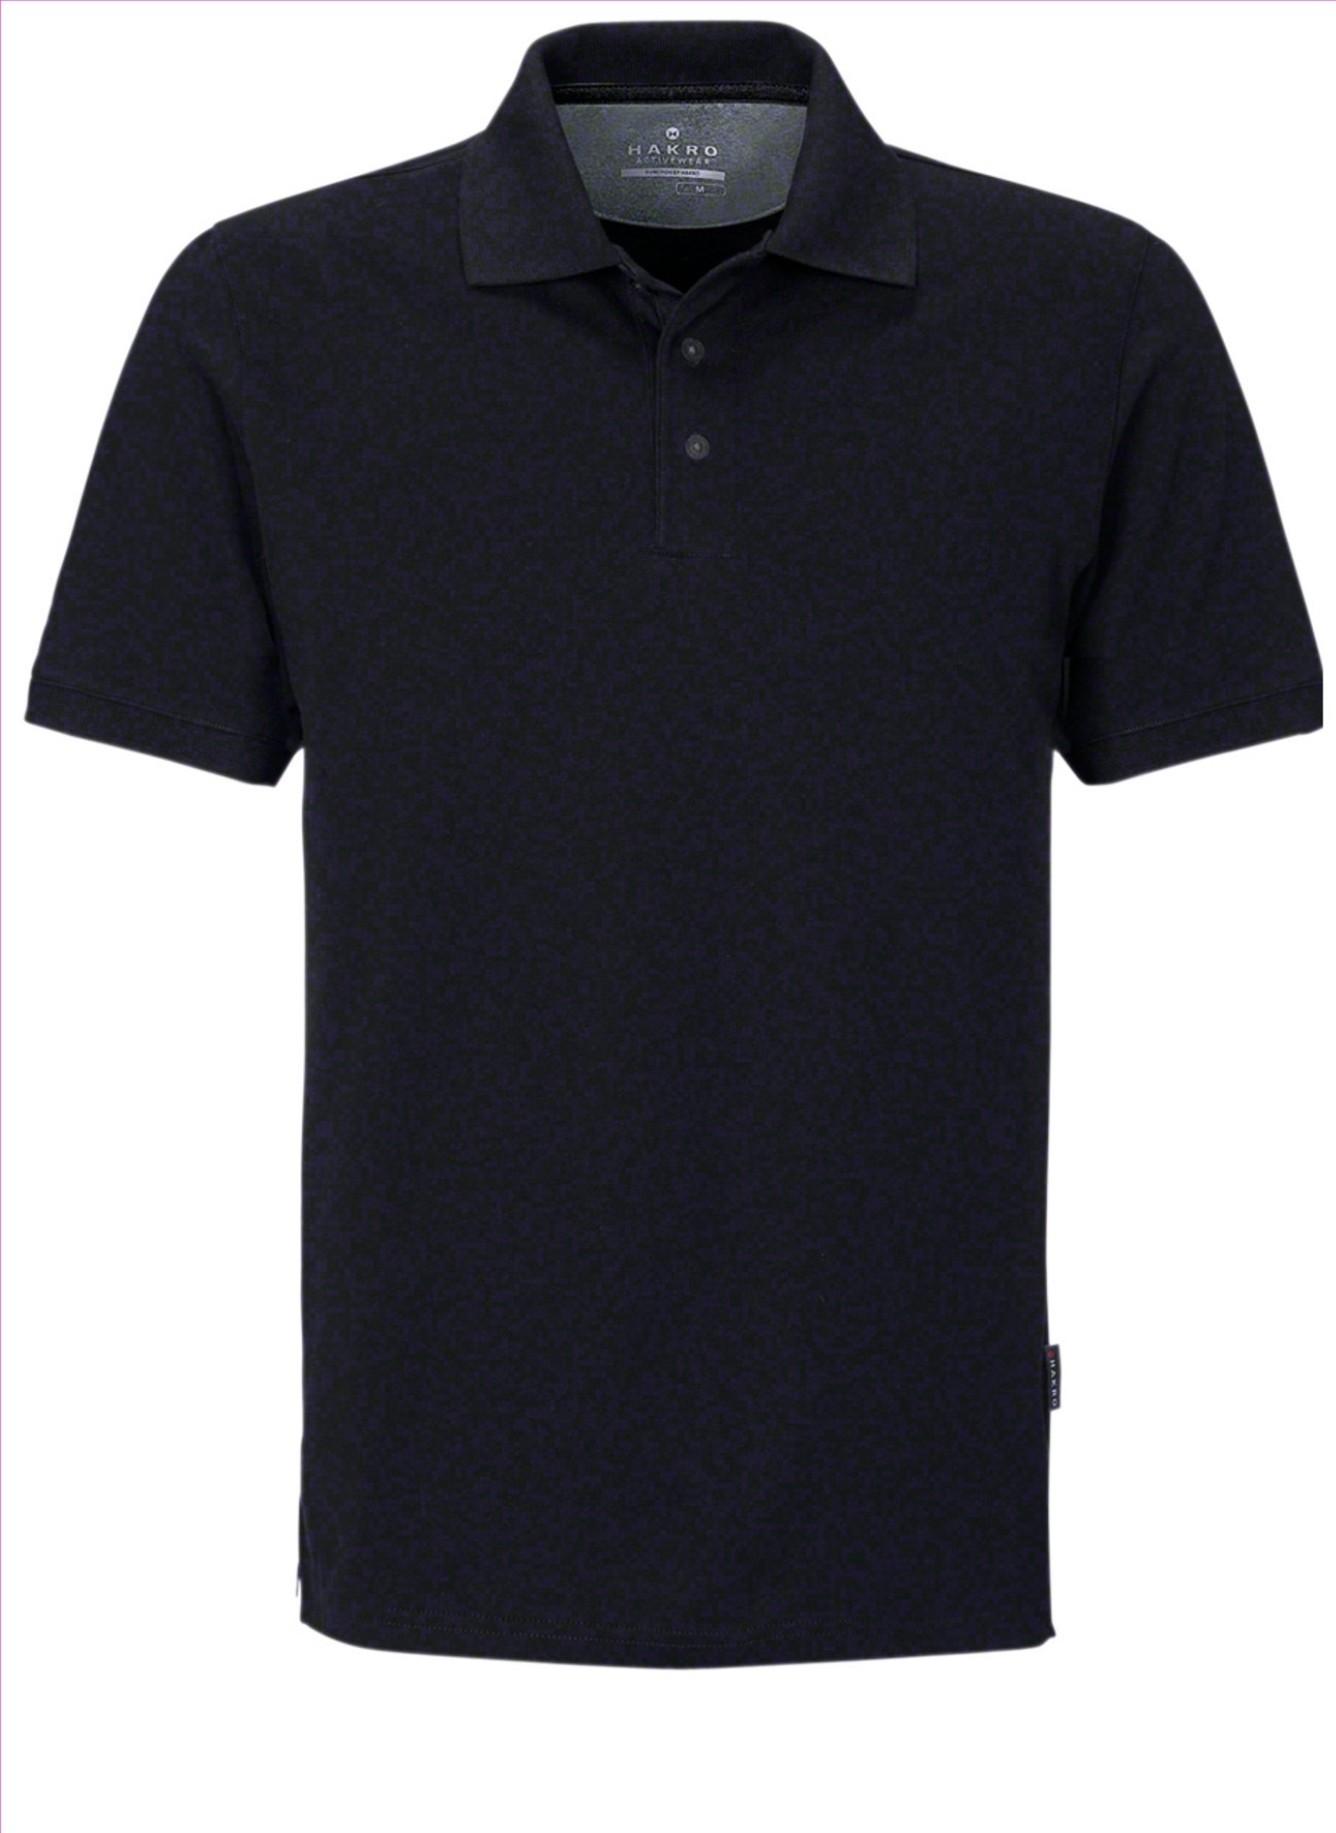 HAKRO Poloshirt Cotton-Tec Herren